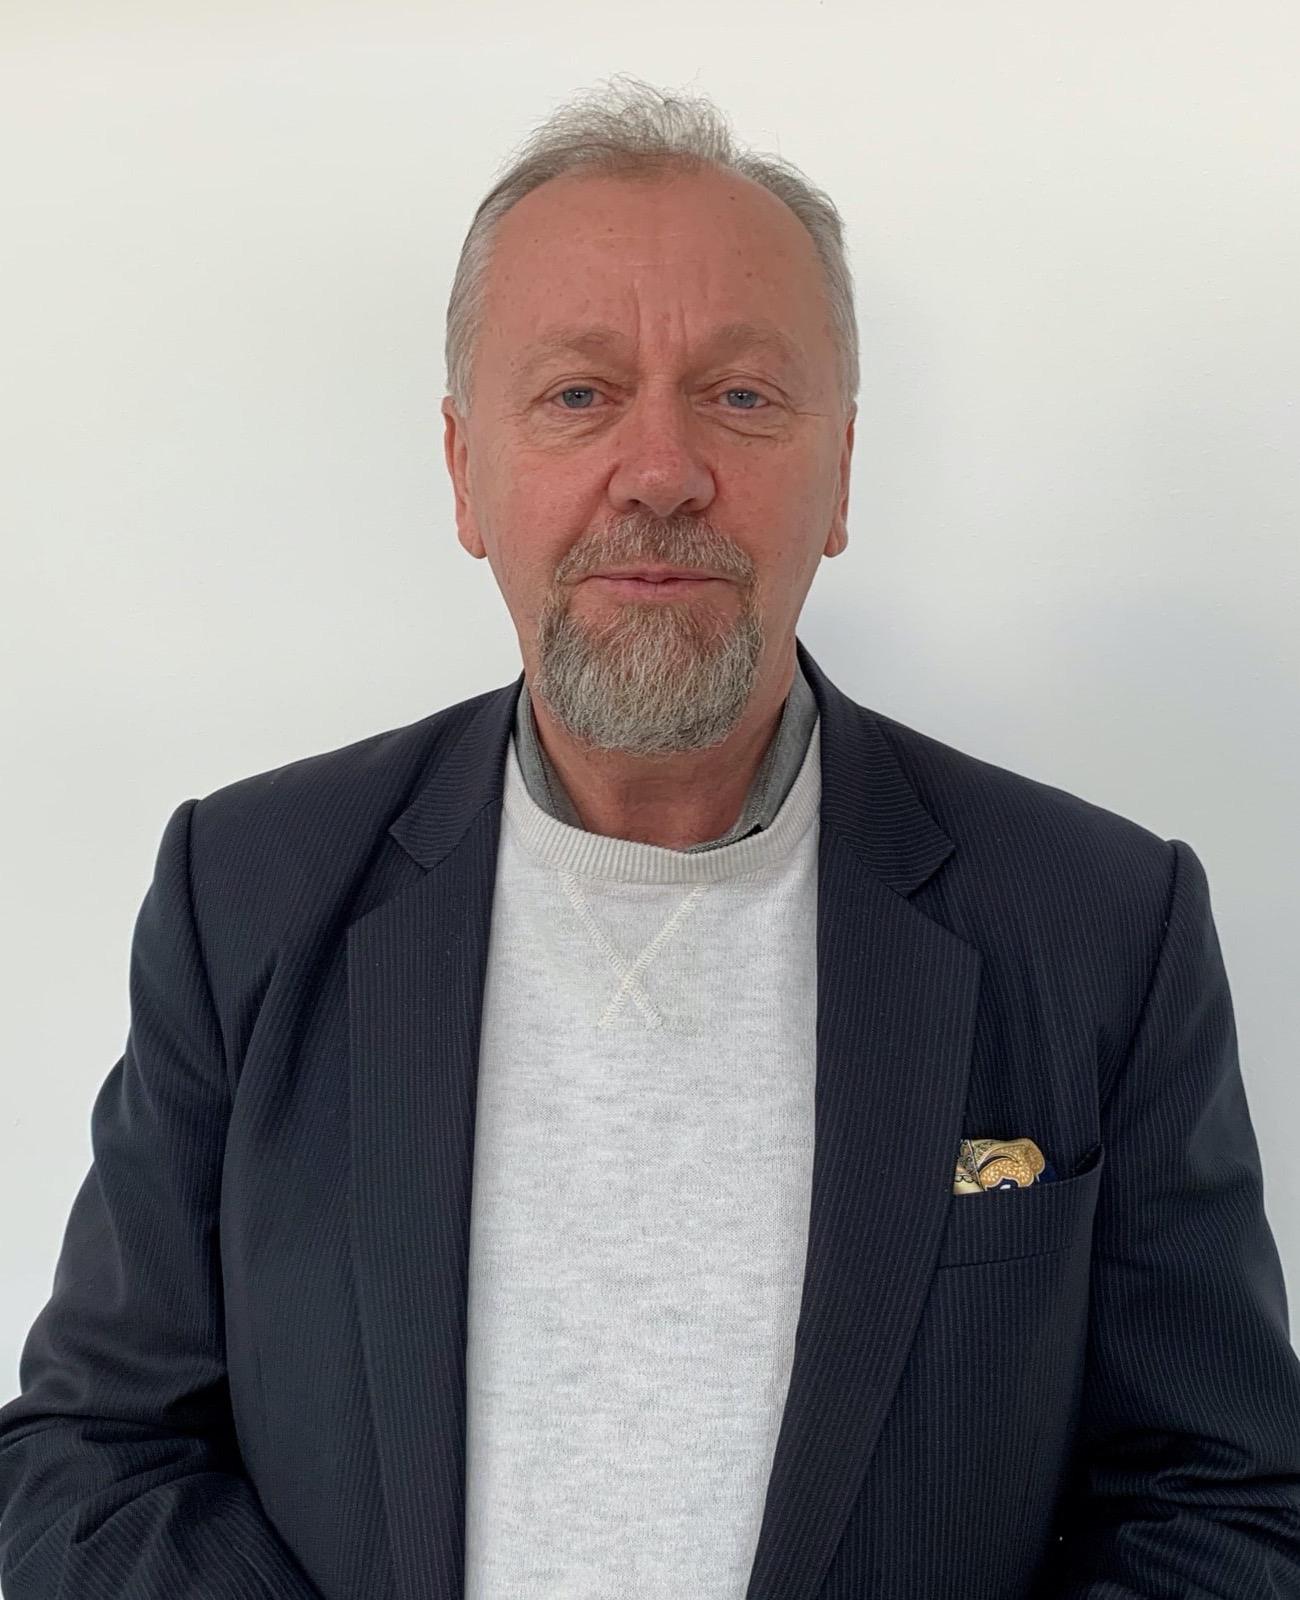 Peter Ståhlberg